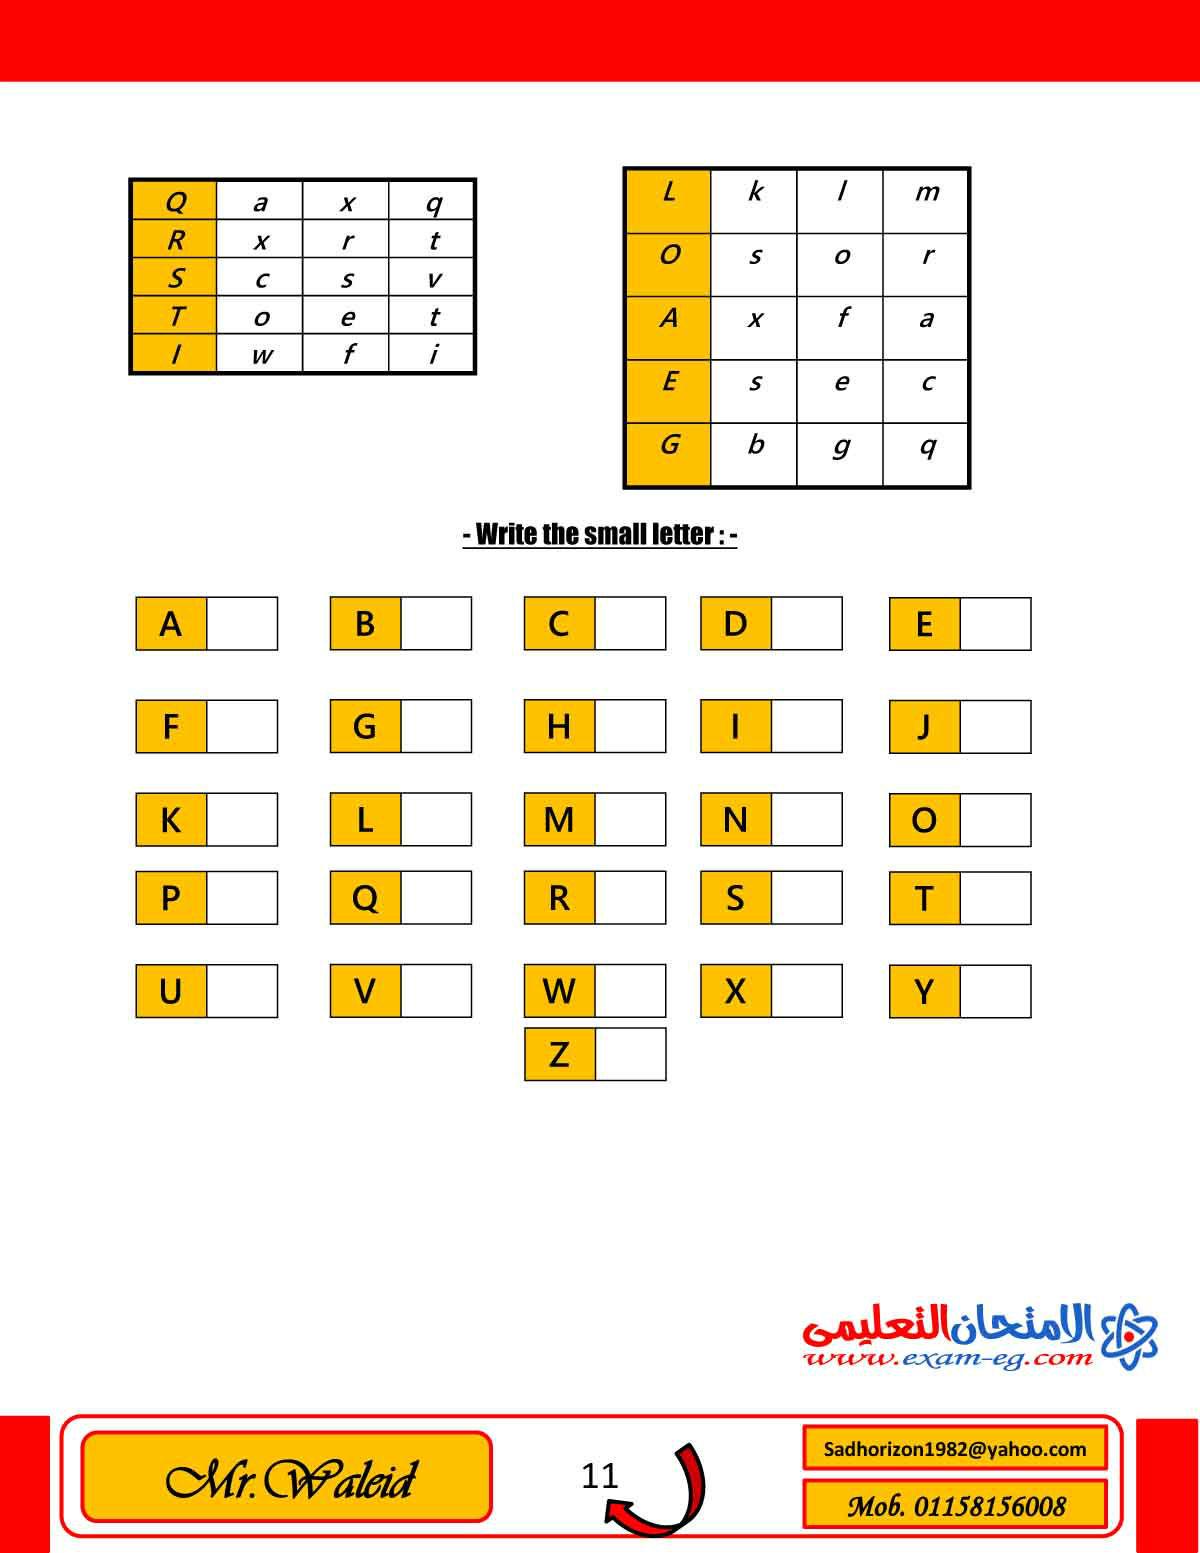 exam-eg.com_14494052435311.jpg